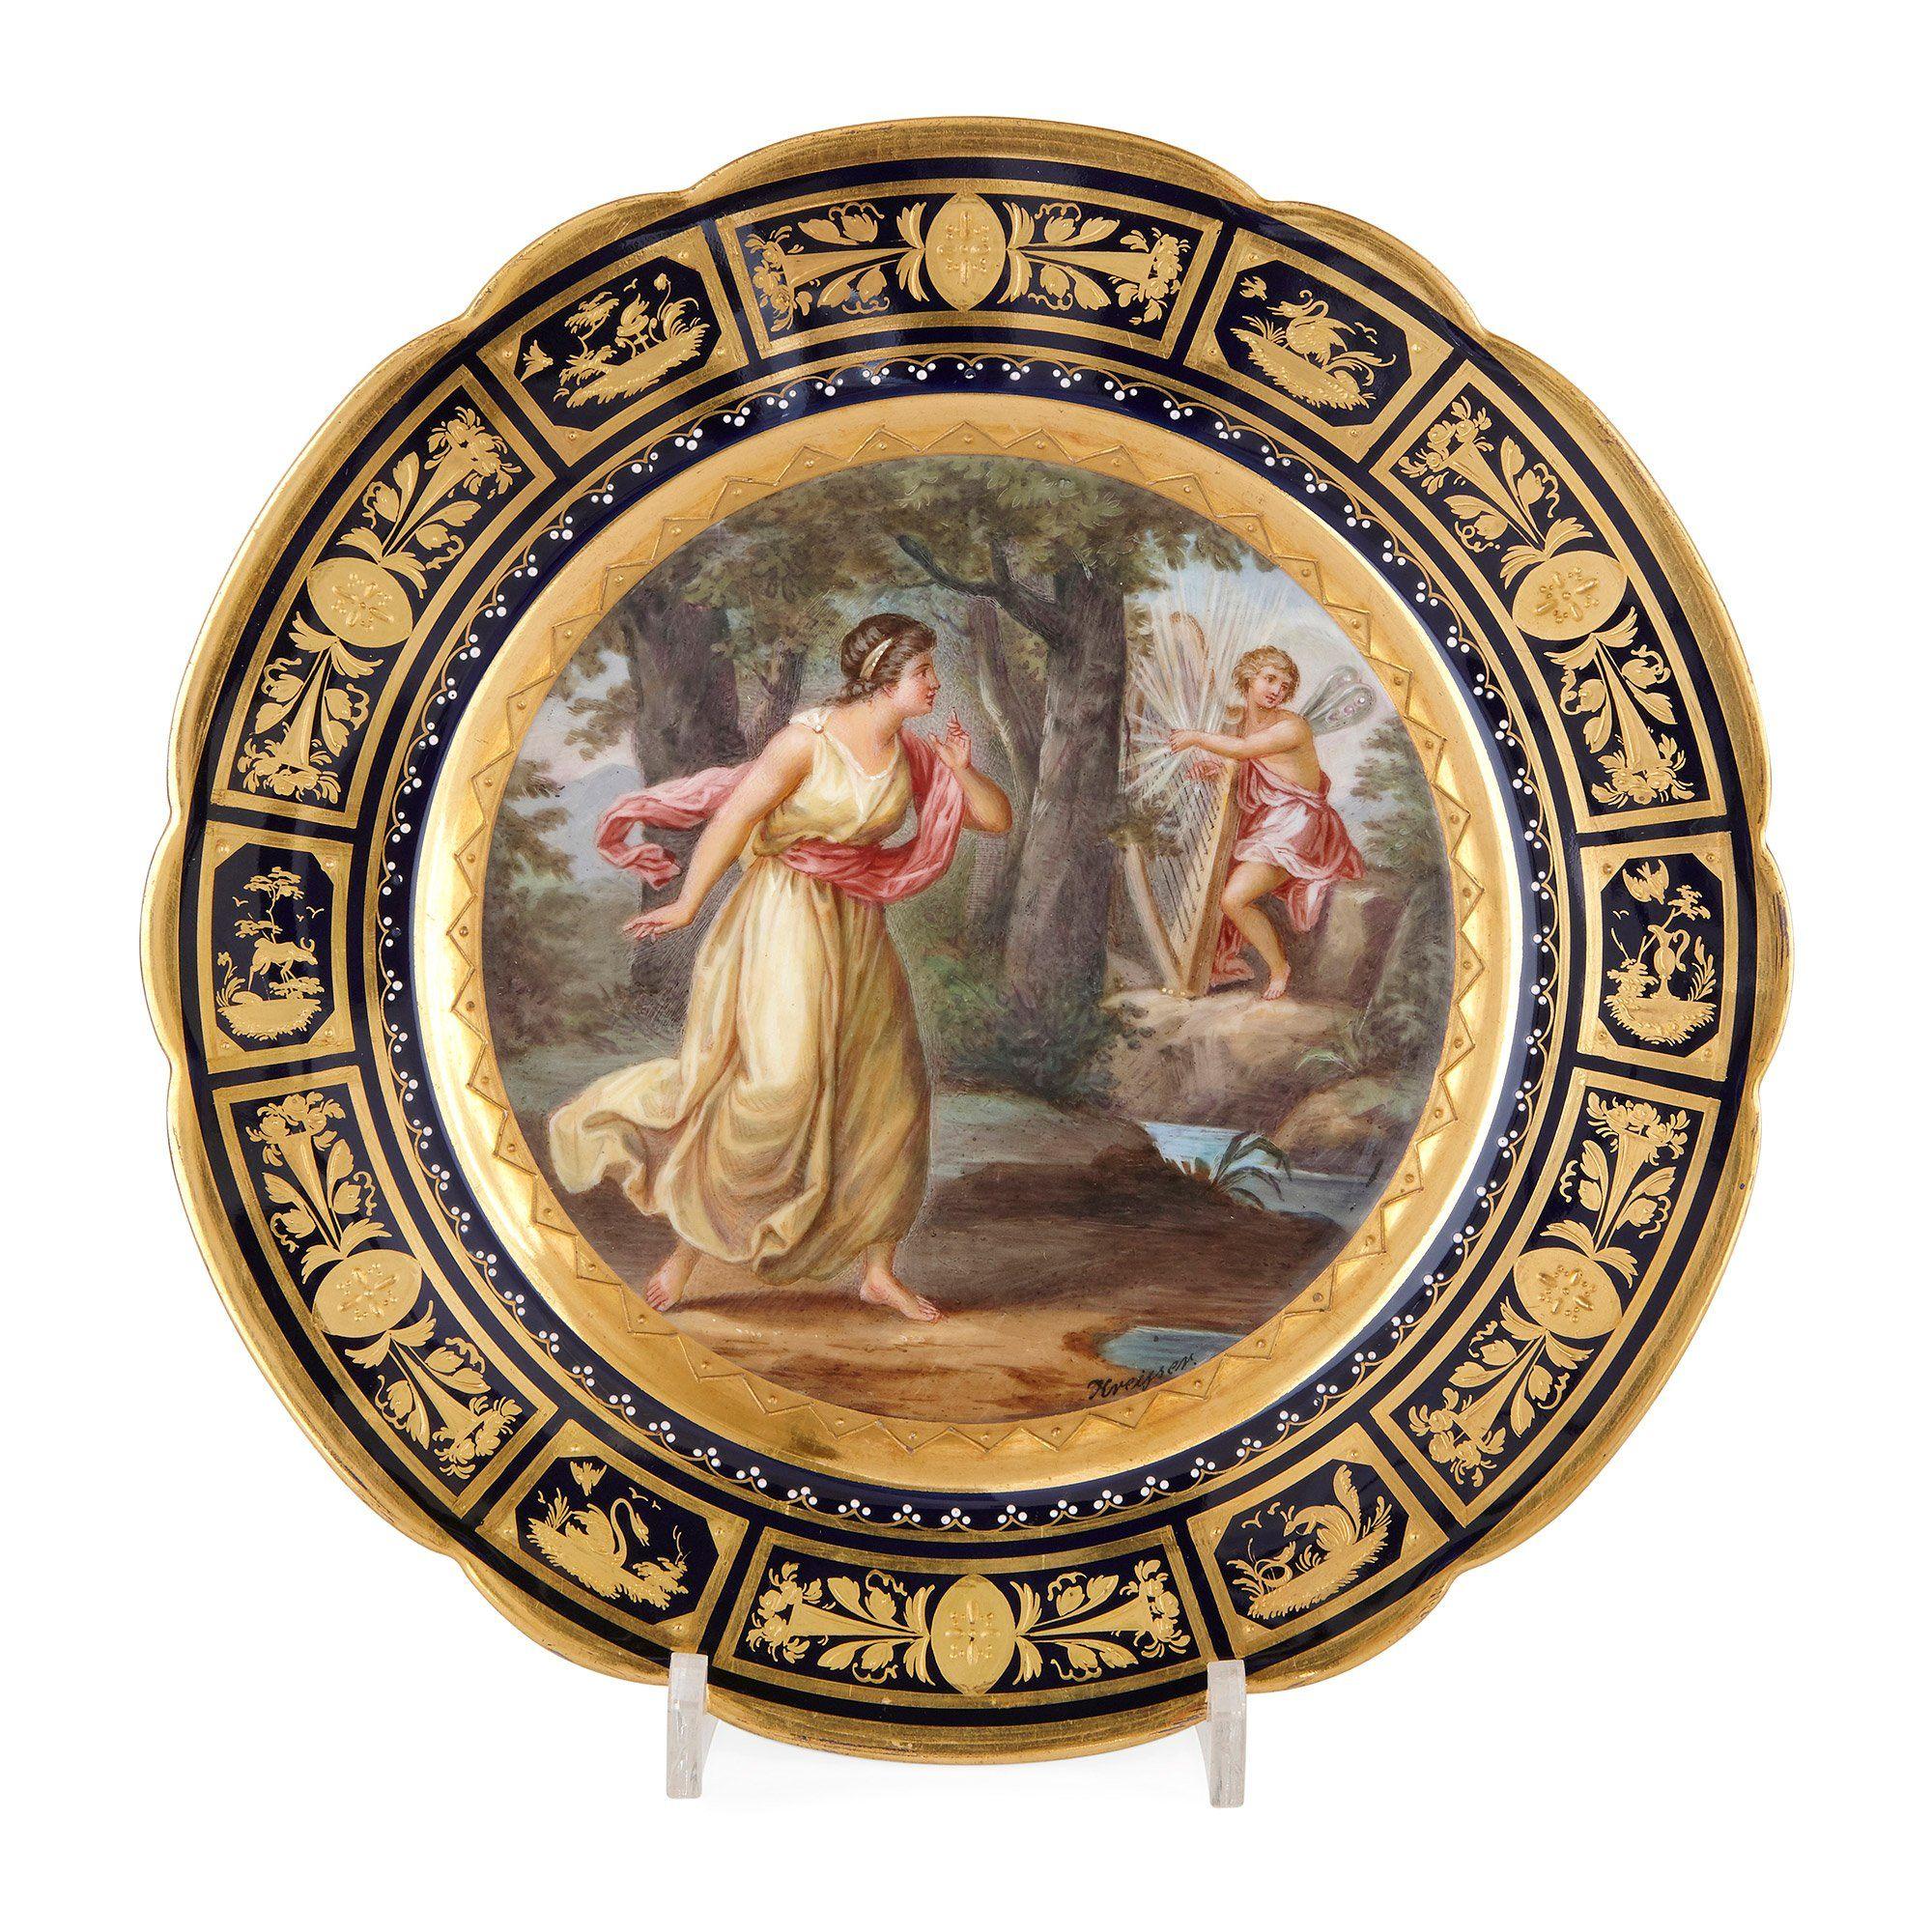 Royal Vienna porcelain antique dessert service | Mayfair